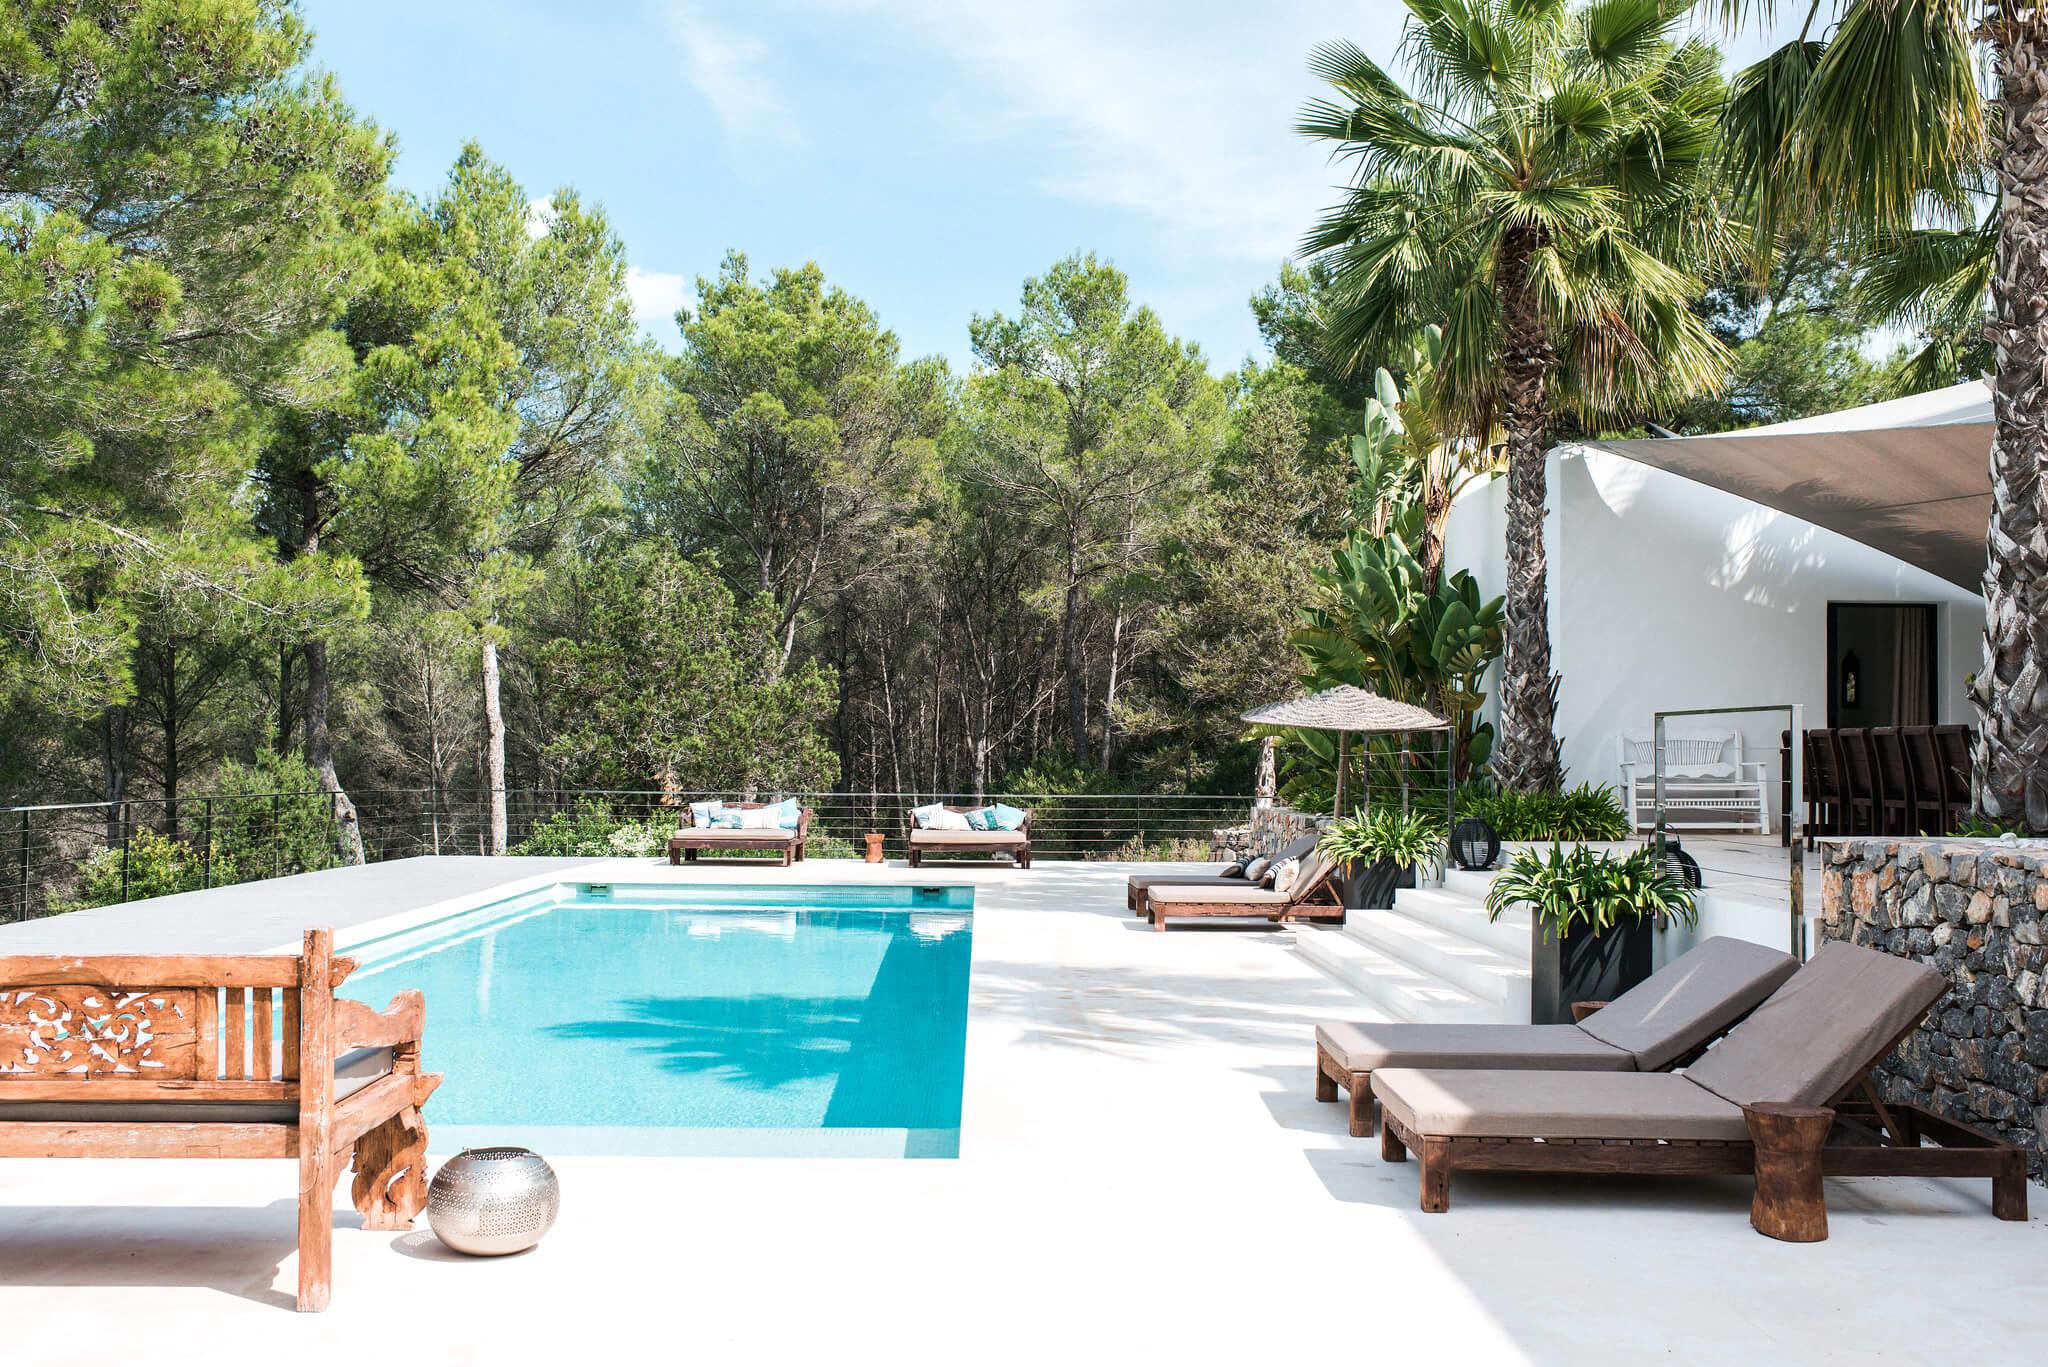 https://www.white-ibiza.com/wp-content/uploads/2020/05/white-ibiza-villas-casa-estrella-exterior-pool.jpg